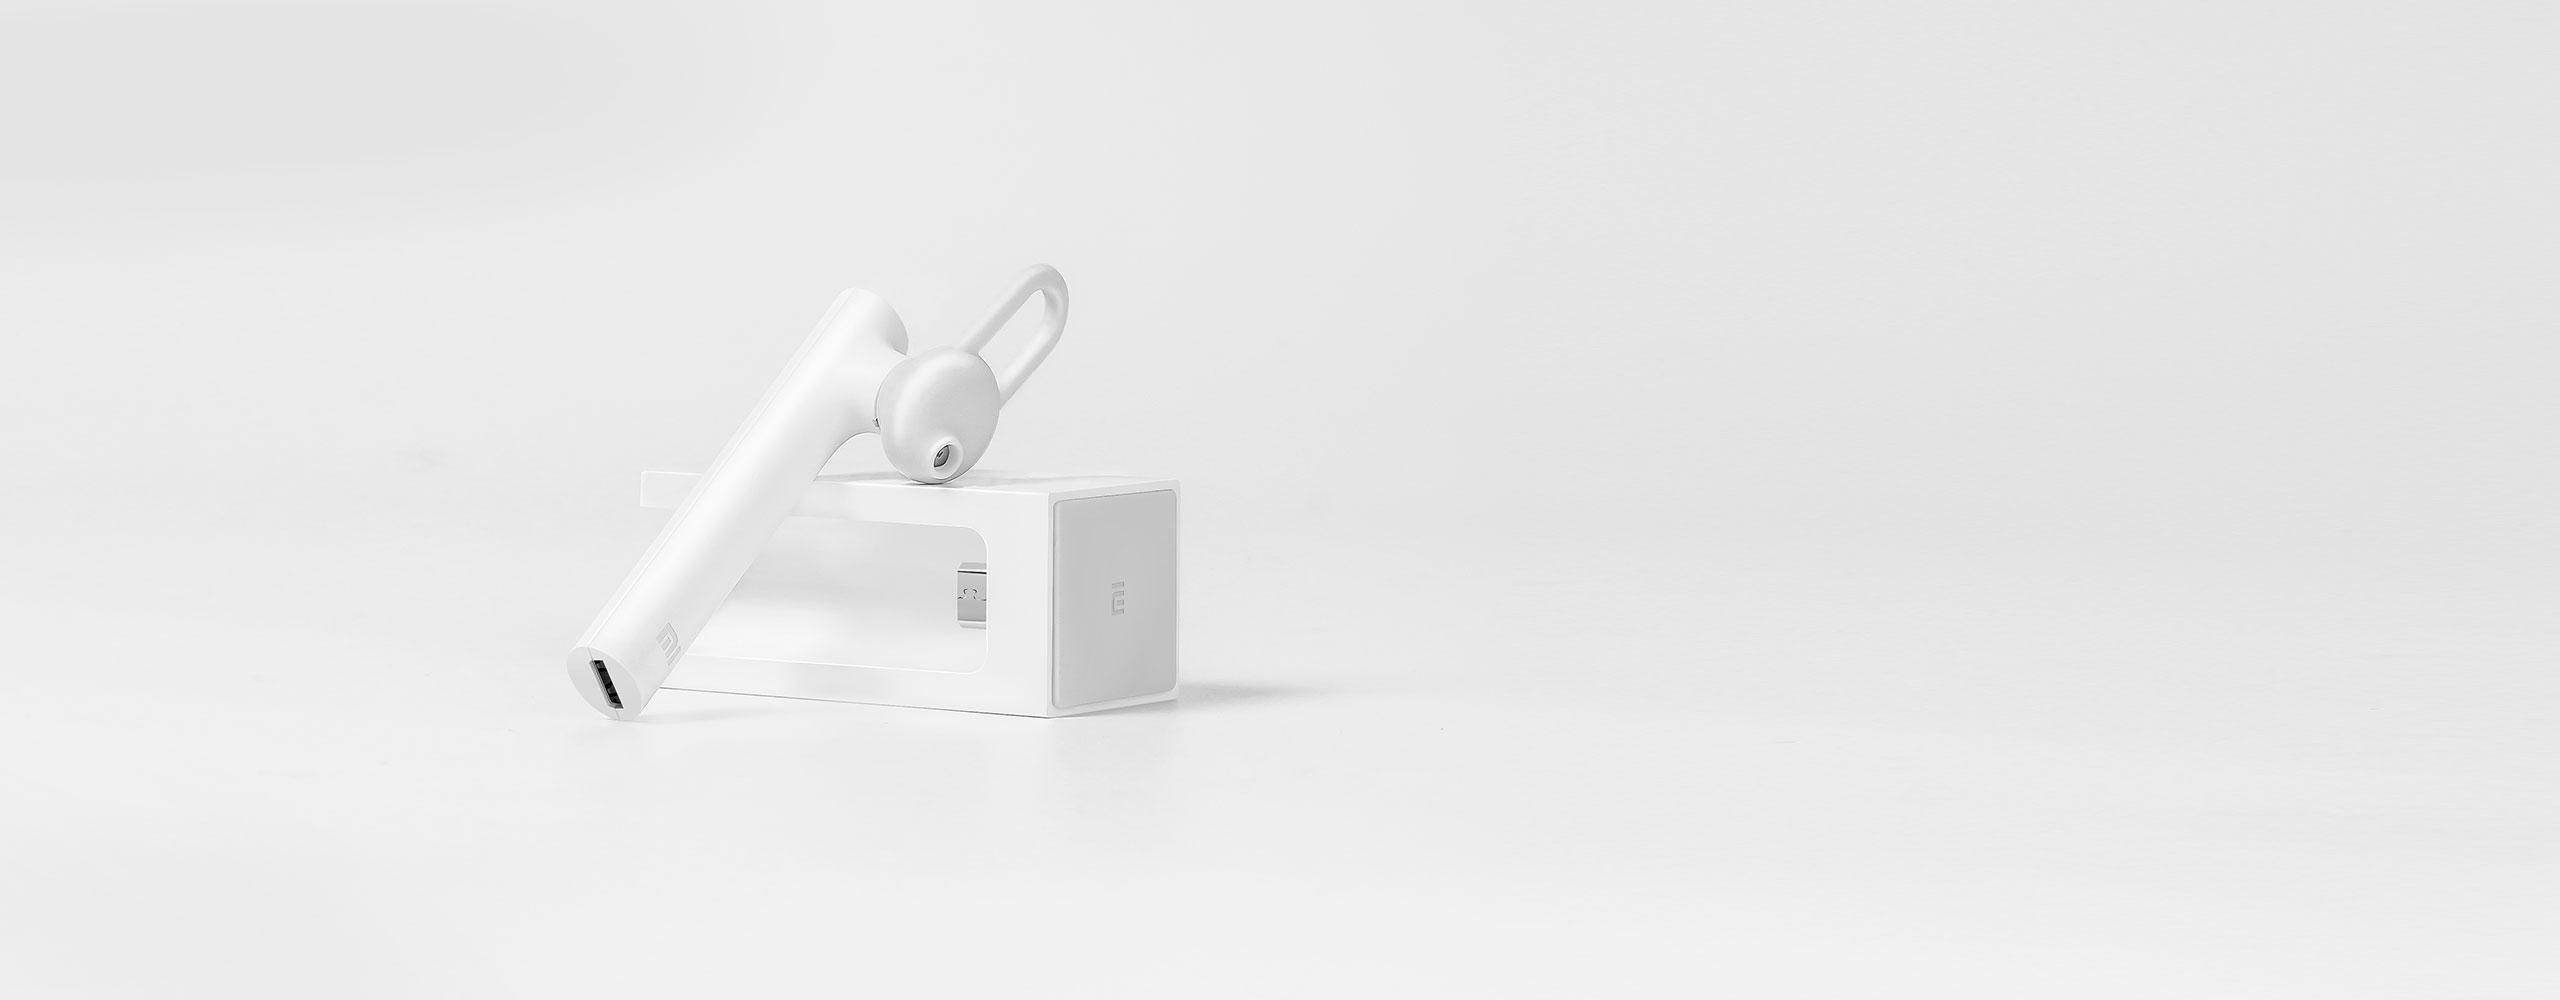 Mi Bluetooth Headset Wireless Earpiece Earphones With Mic Charging Dock Black Xiaomi United States